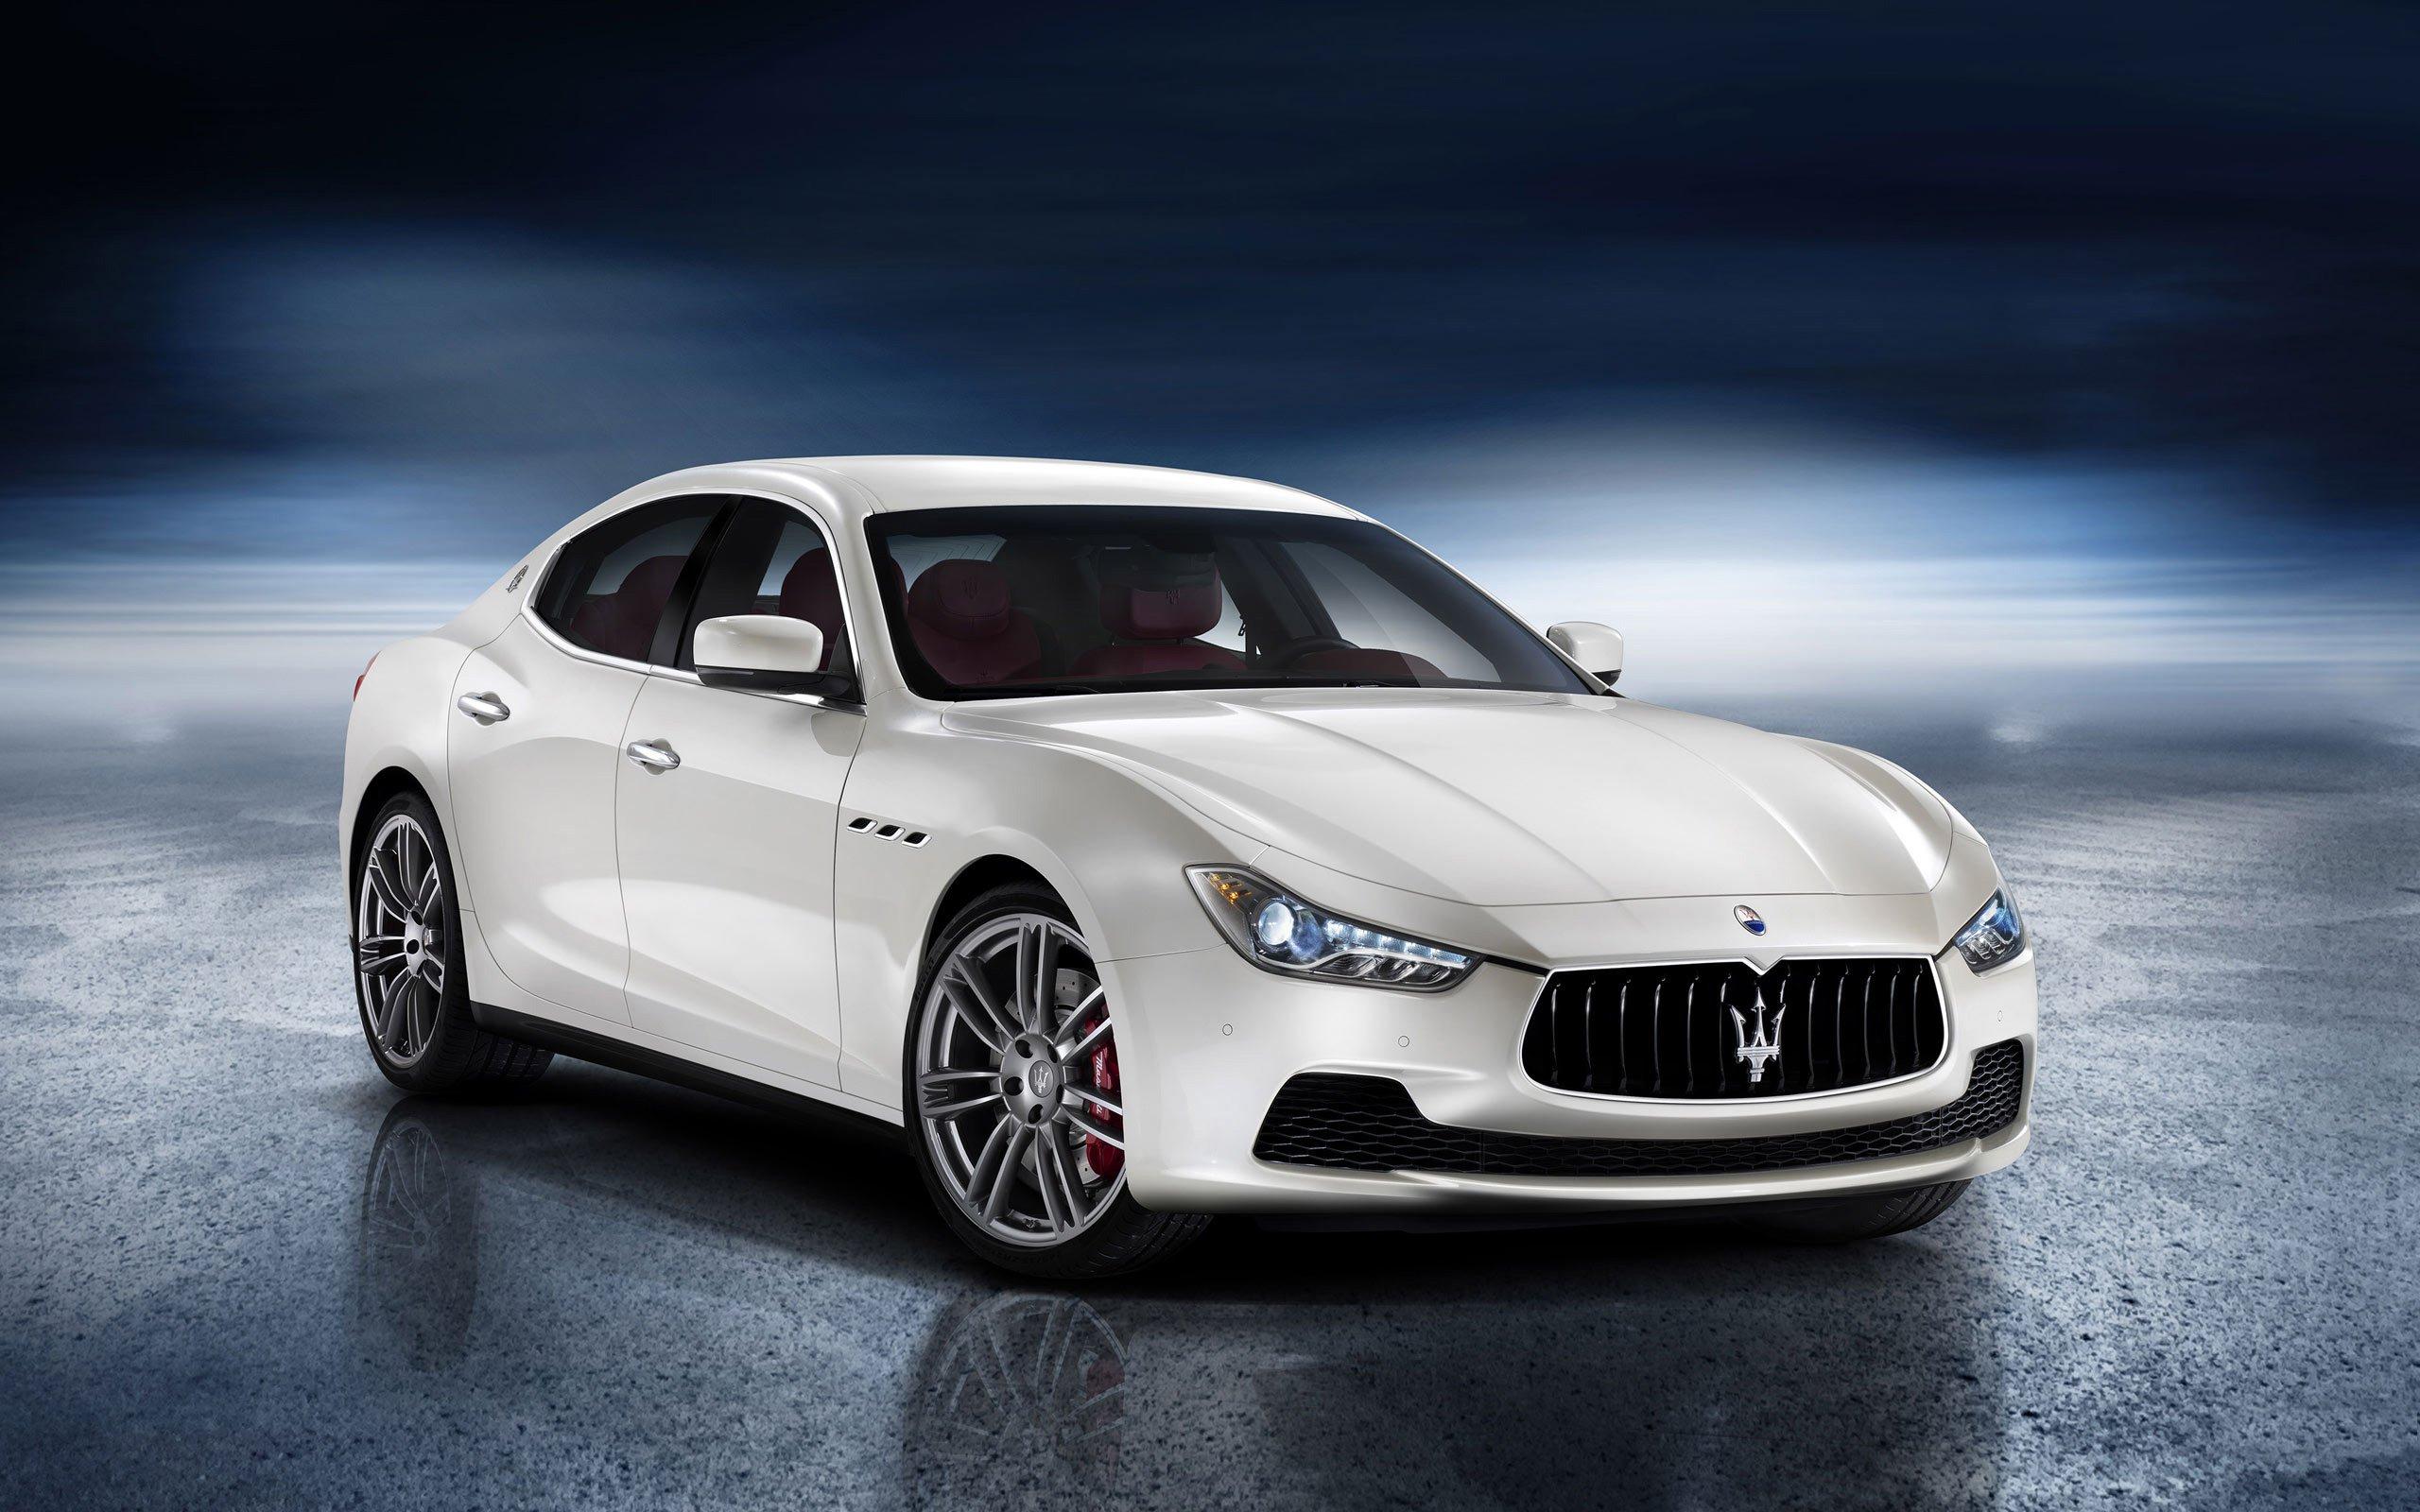 2014 Maserati Ghibli Wallpaper HD Car Wallpapers 2560x1600